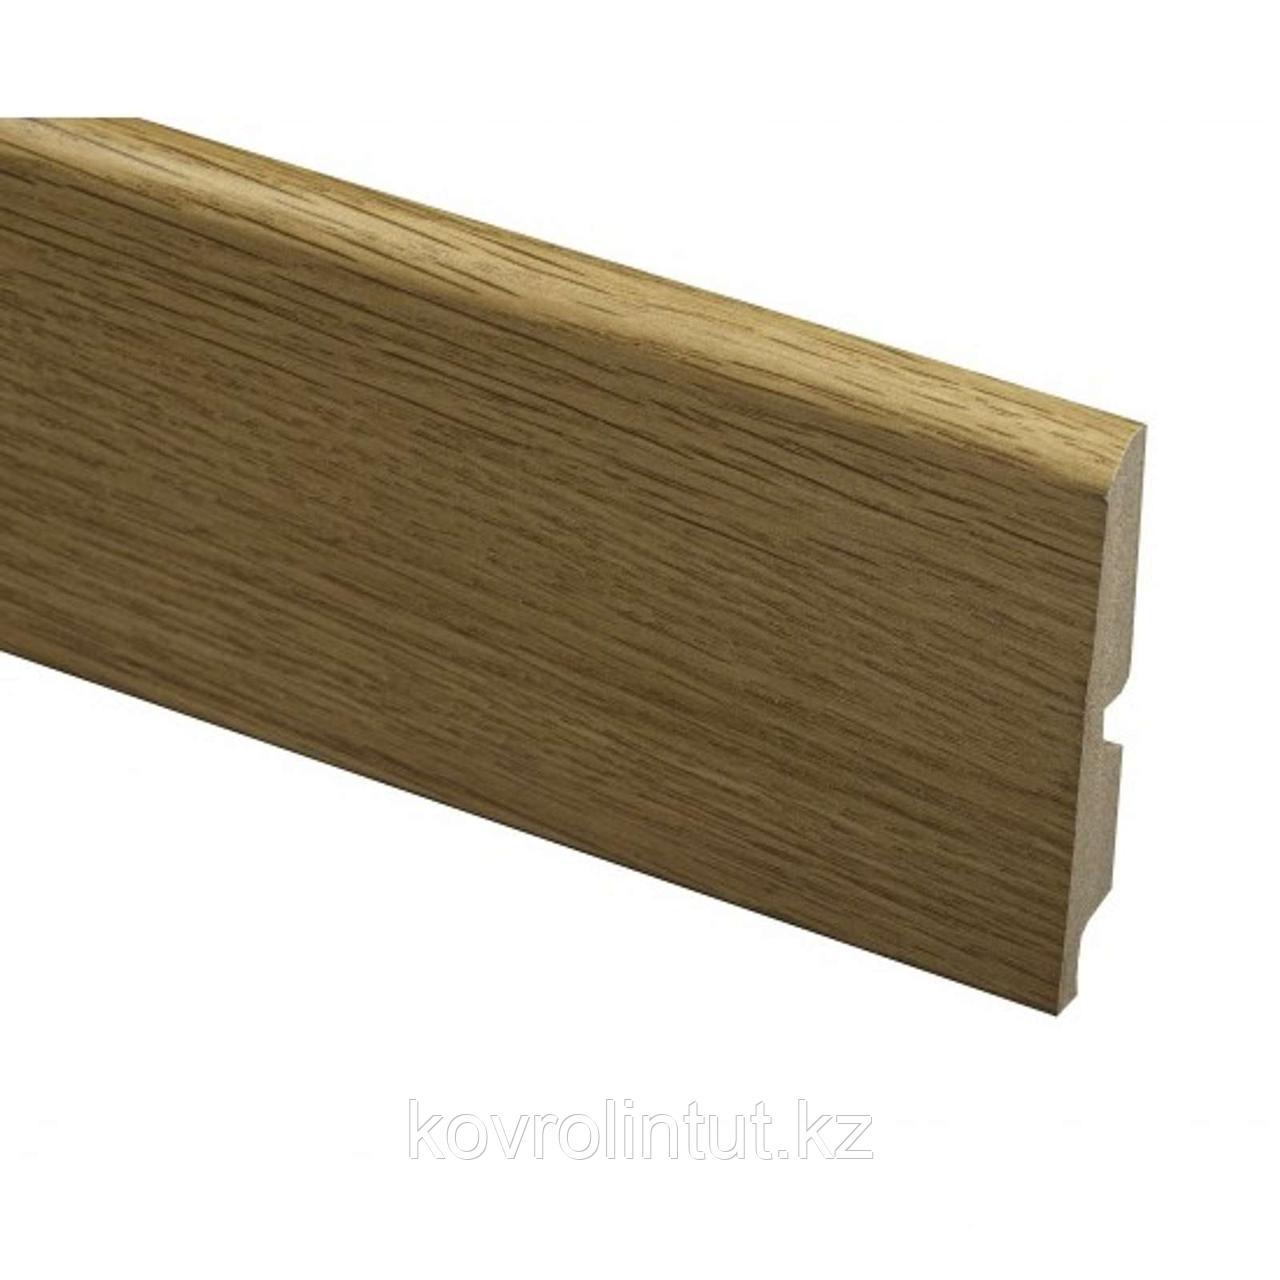 Плинтус Kronopol P85 4588 Sunflower Oak, 2500х85х16мм, 9шт/уп